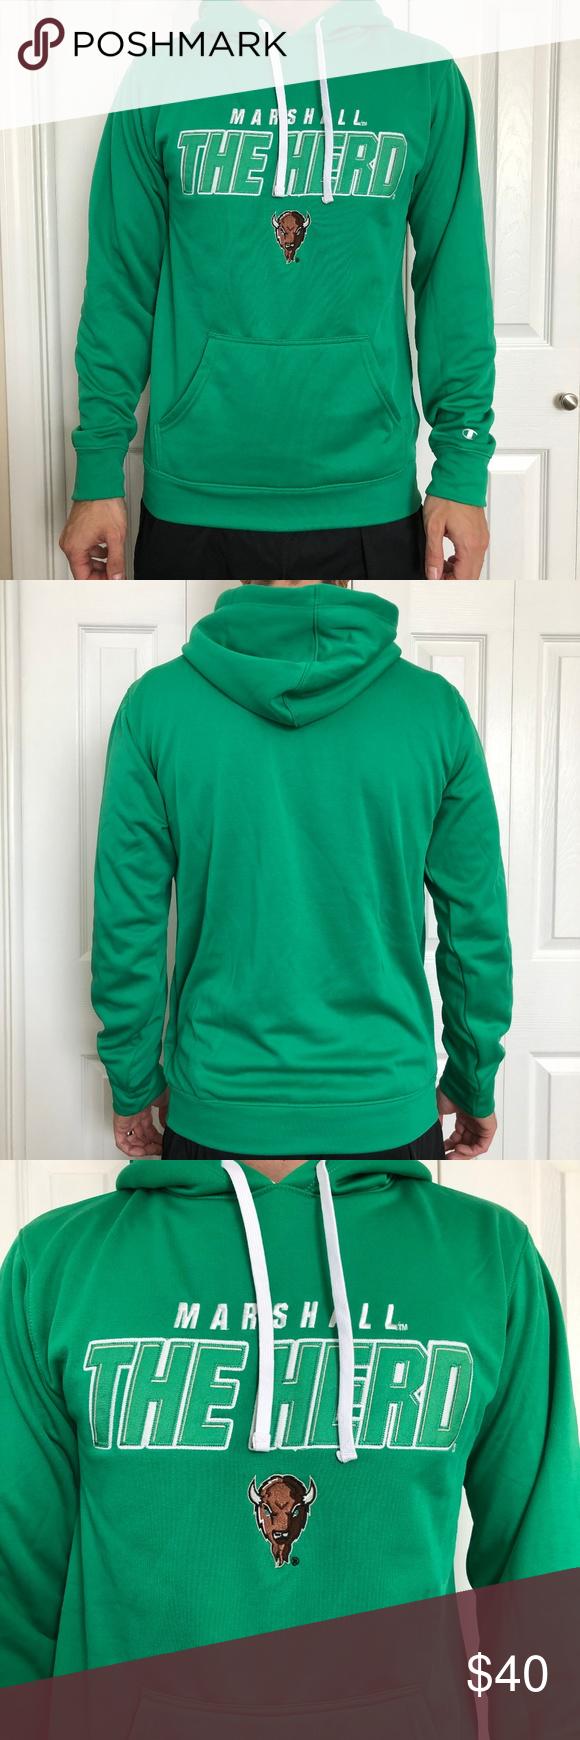 Champion Marshall The Thundering Herd Hoodie S Clothes Design Pullover Sweatshirts Sweatshirt Shirt [ 1740 x 580 Pixel ]